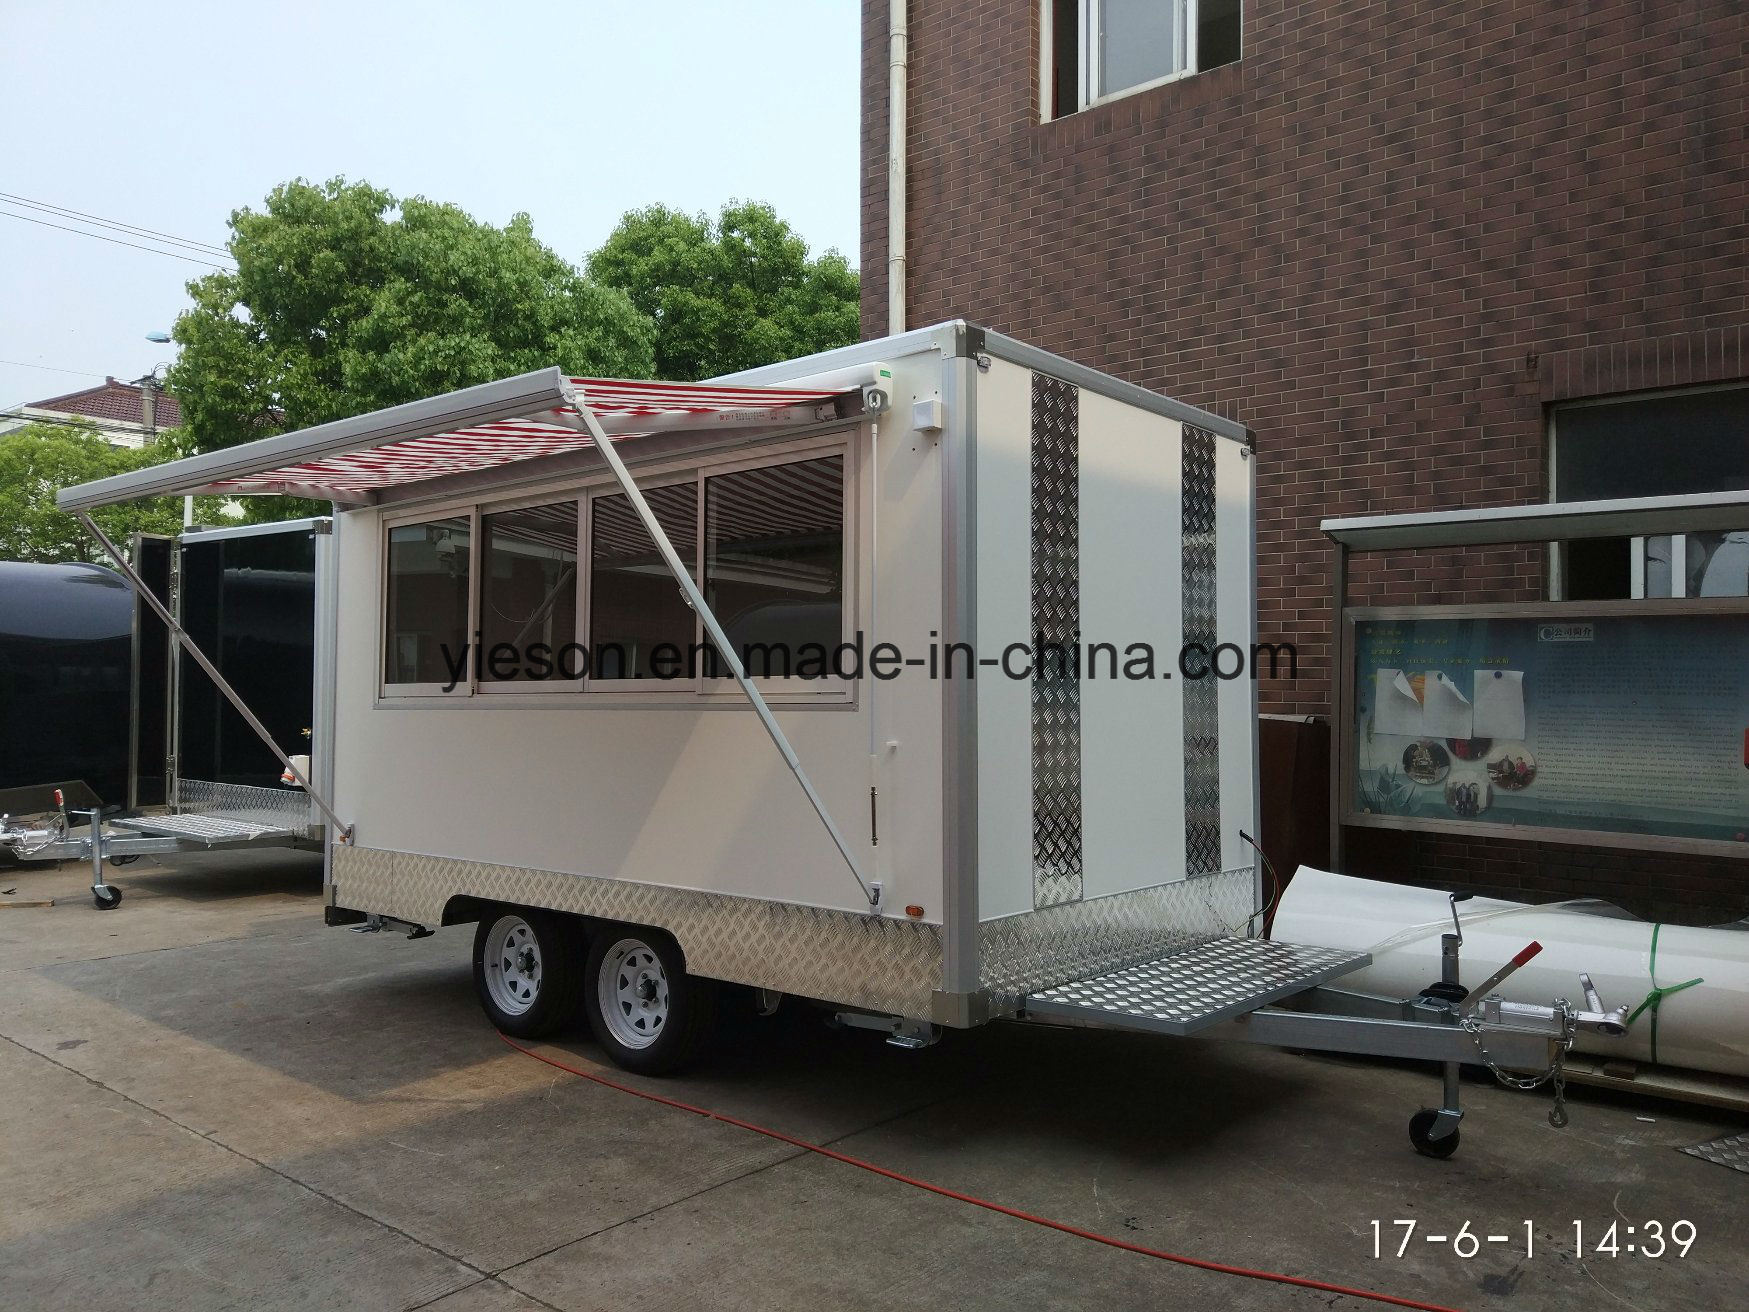 Yieson Made Mobile Food Van for Sale